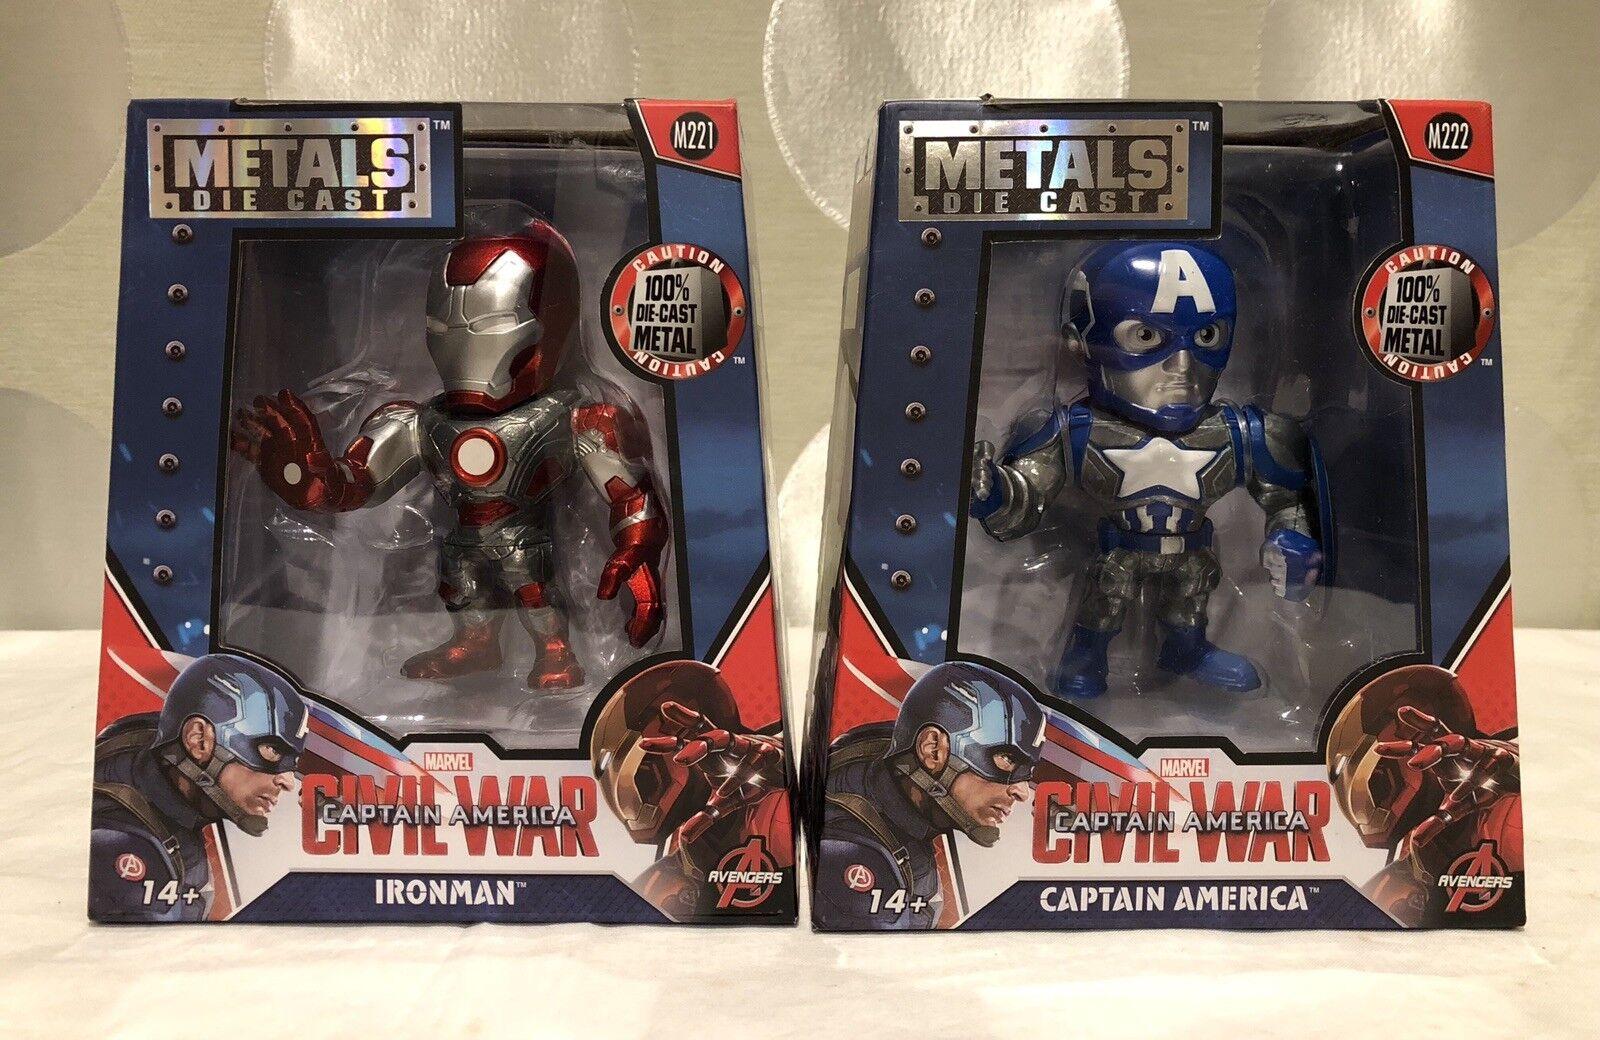 Marvel bürgerkrieg captain america - ironman und captain america - druckguss